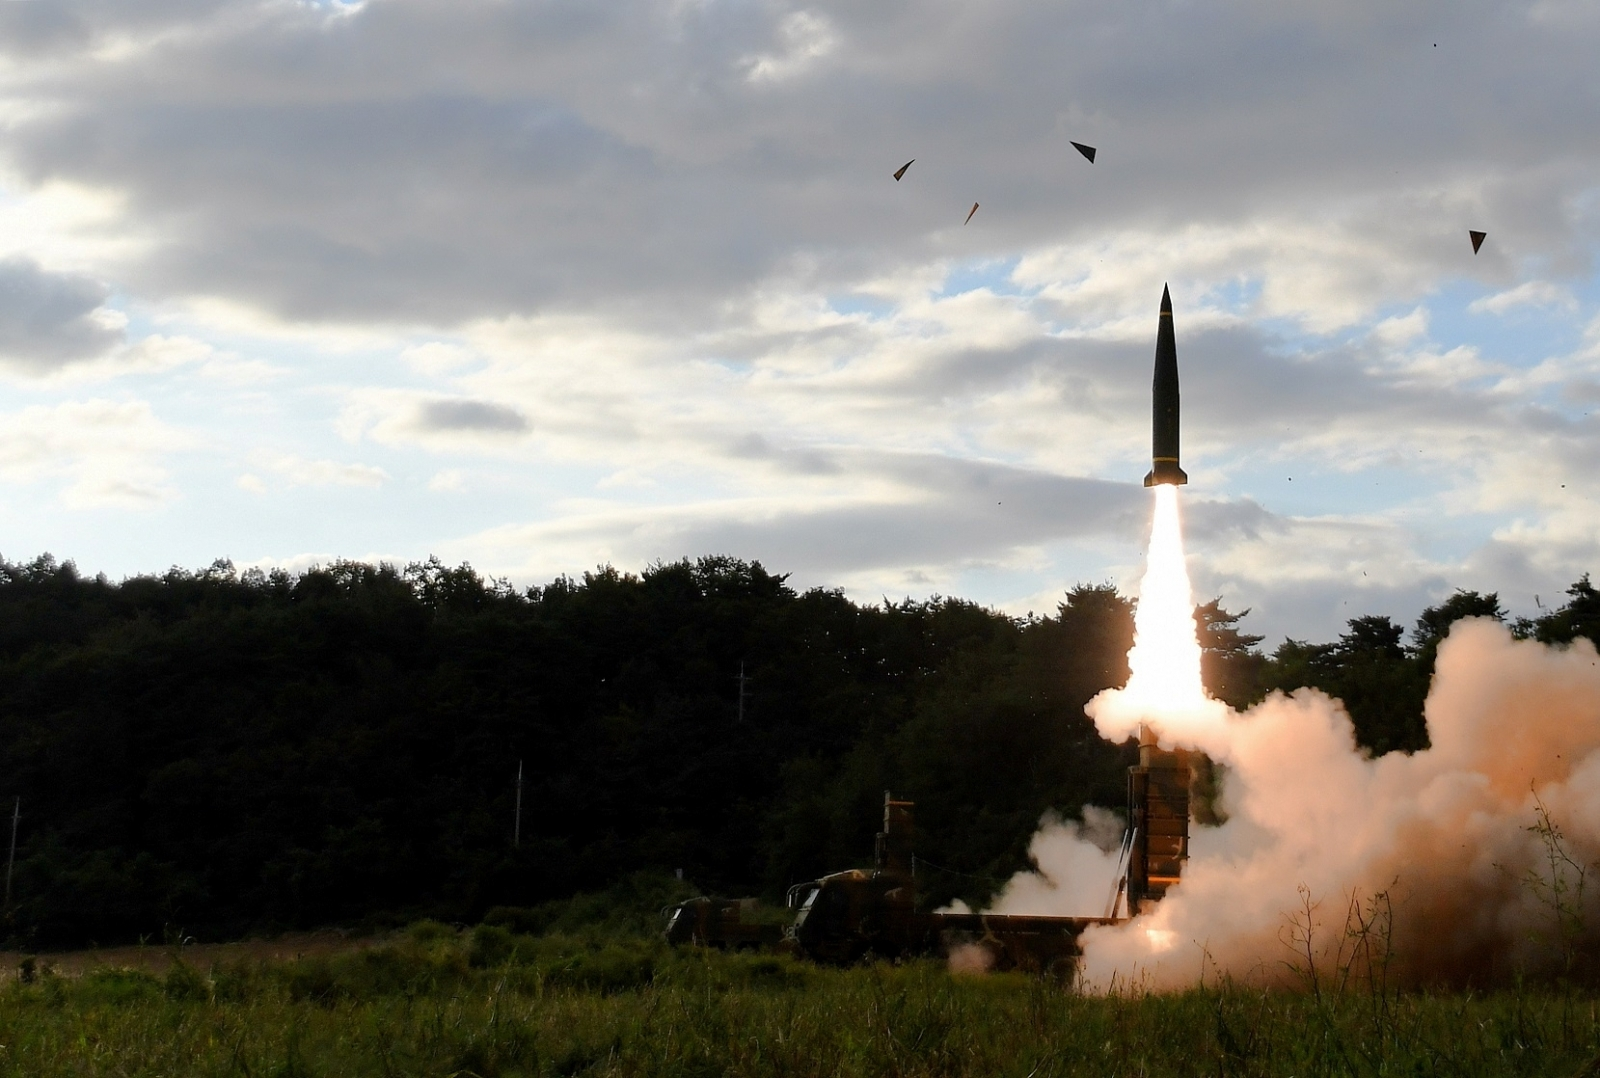 South Korea missiles against North Korea